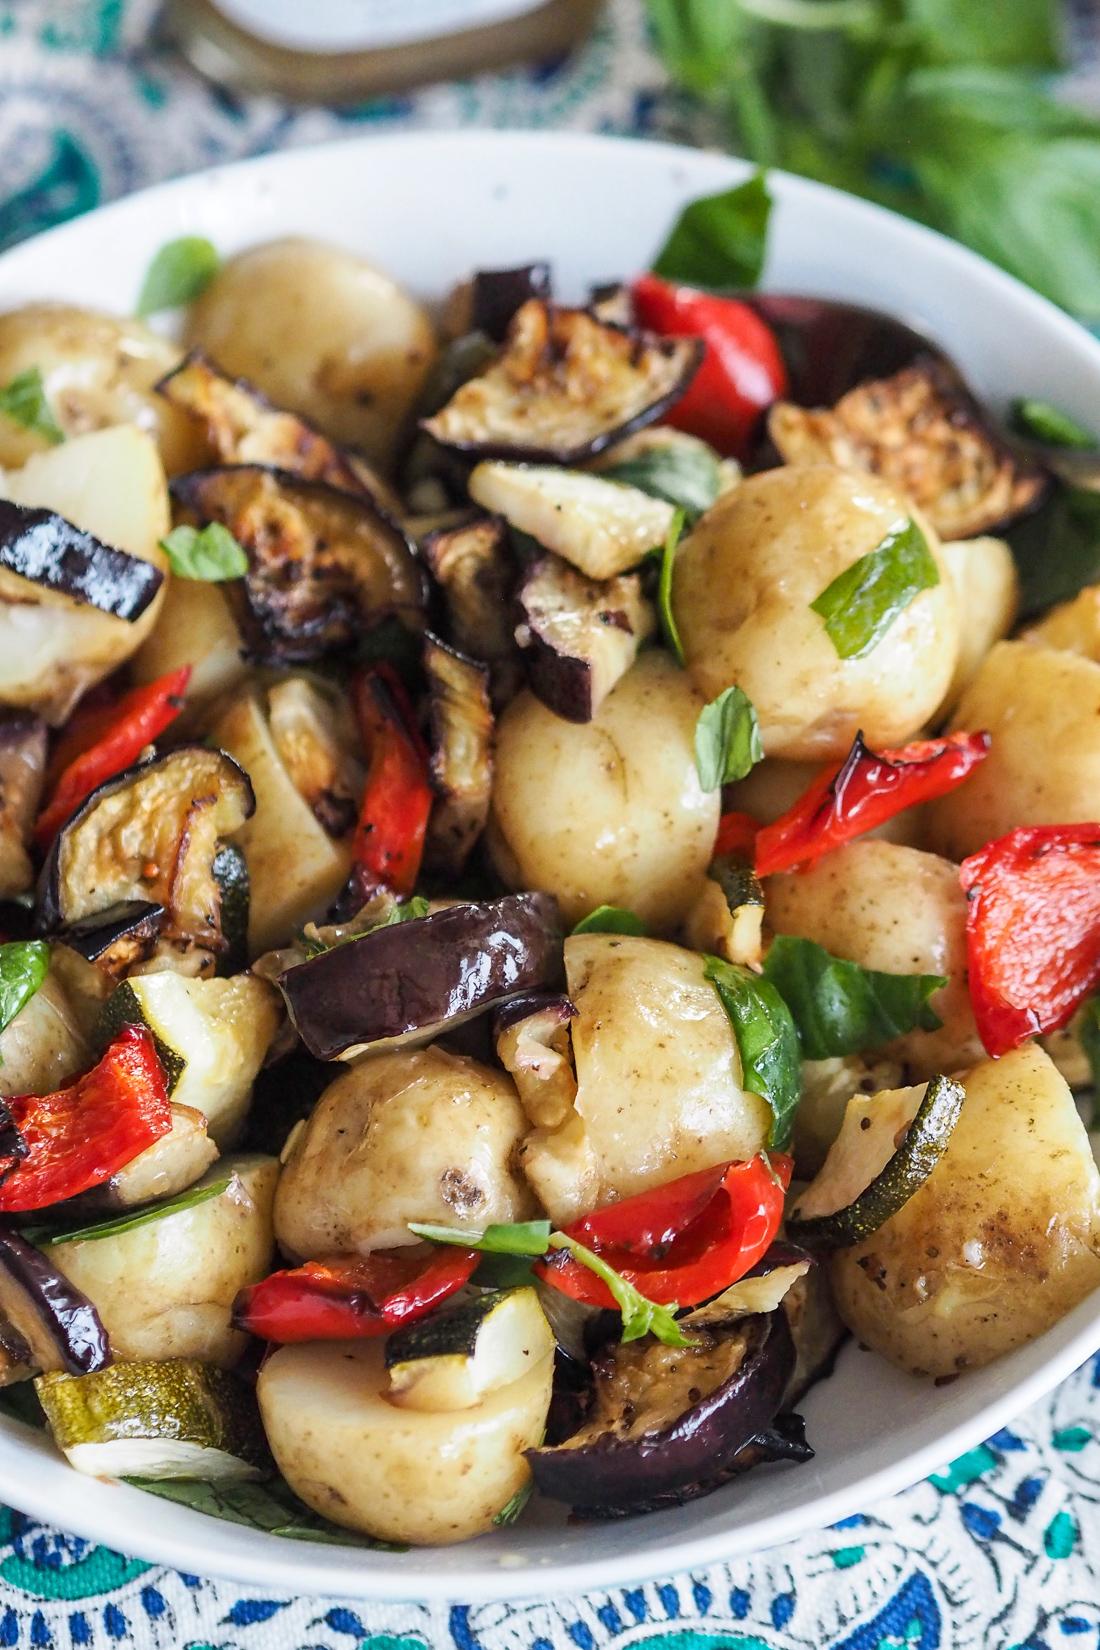 new potato and roast vegetable salad with italian dressing